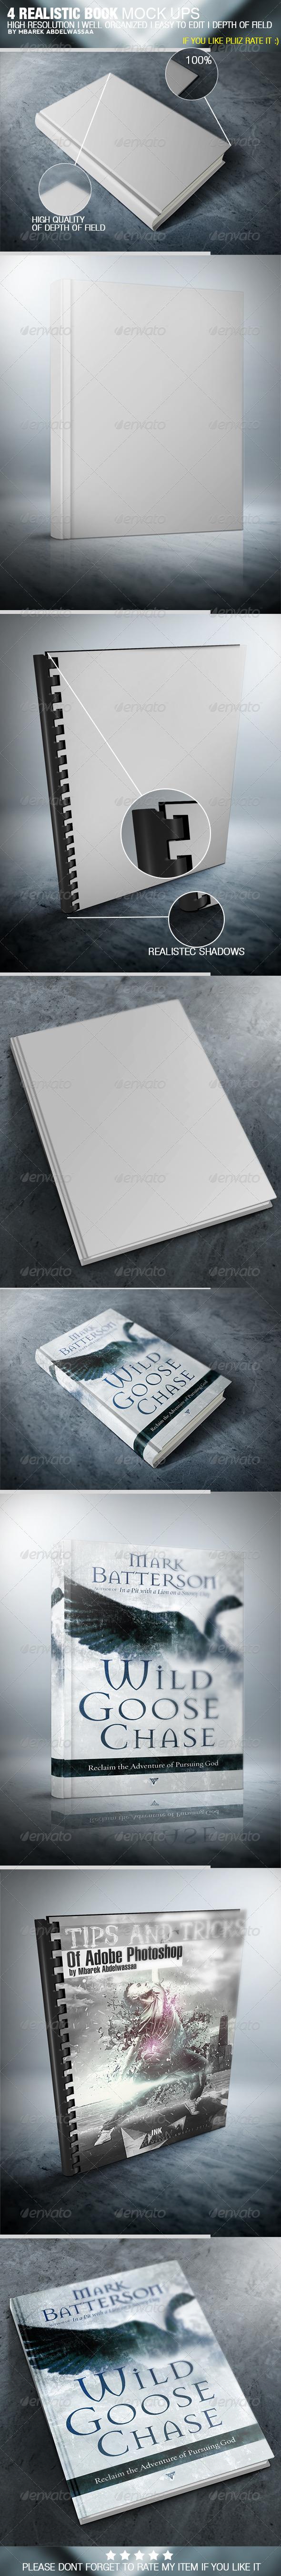 4 Realistic Book Cover Mock Ups